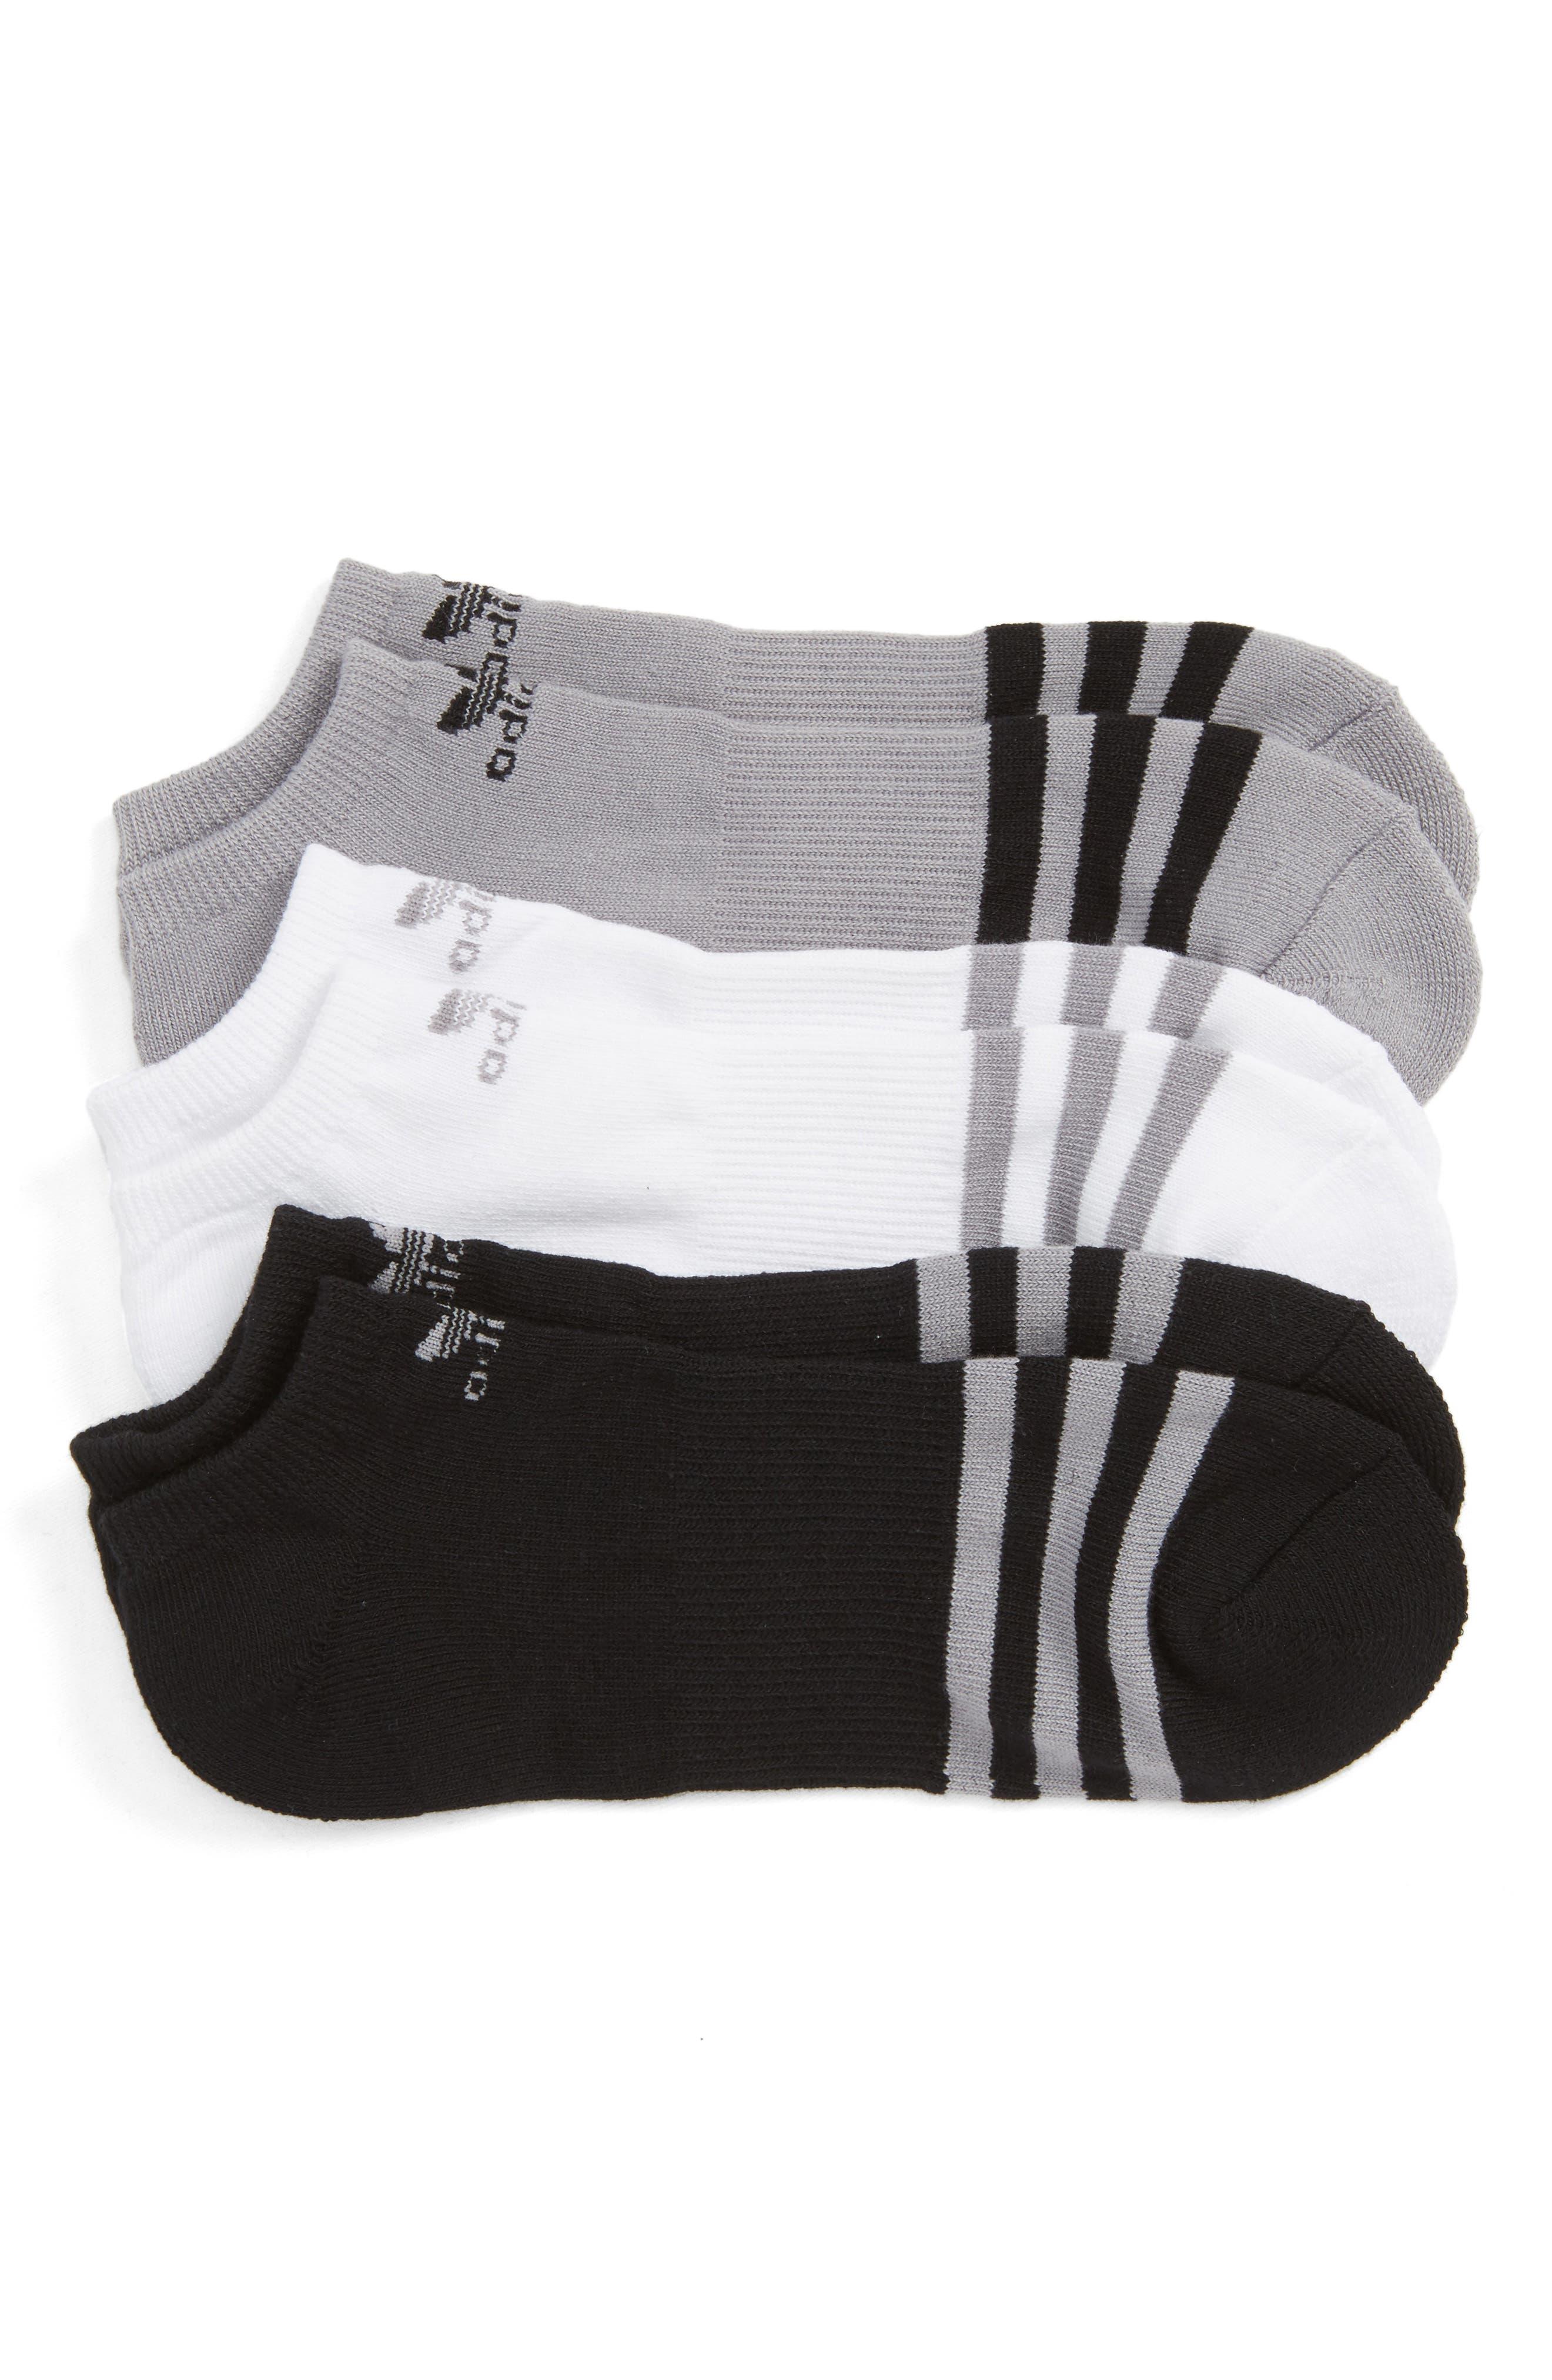 Alternate Image 1 Selected - adidas Originals 3-Pack No-Show Socks